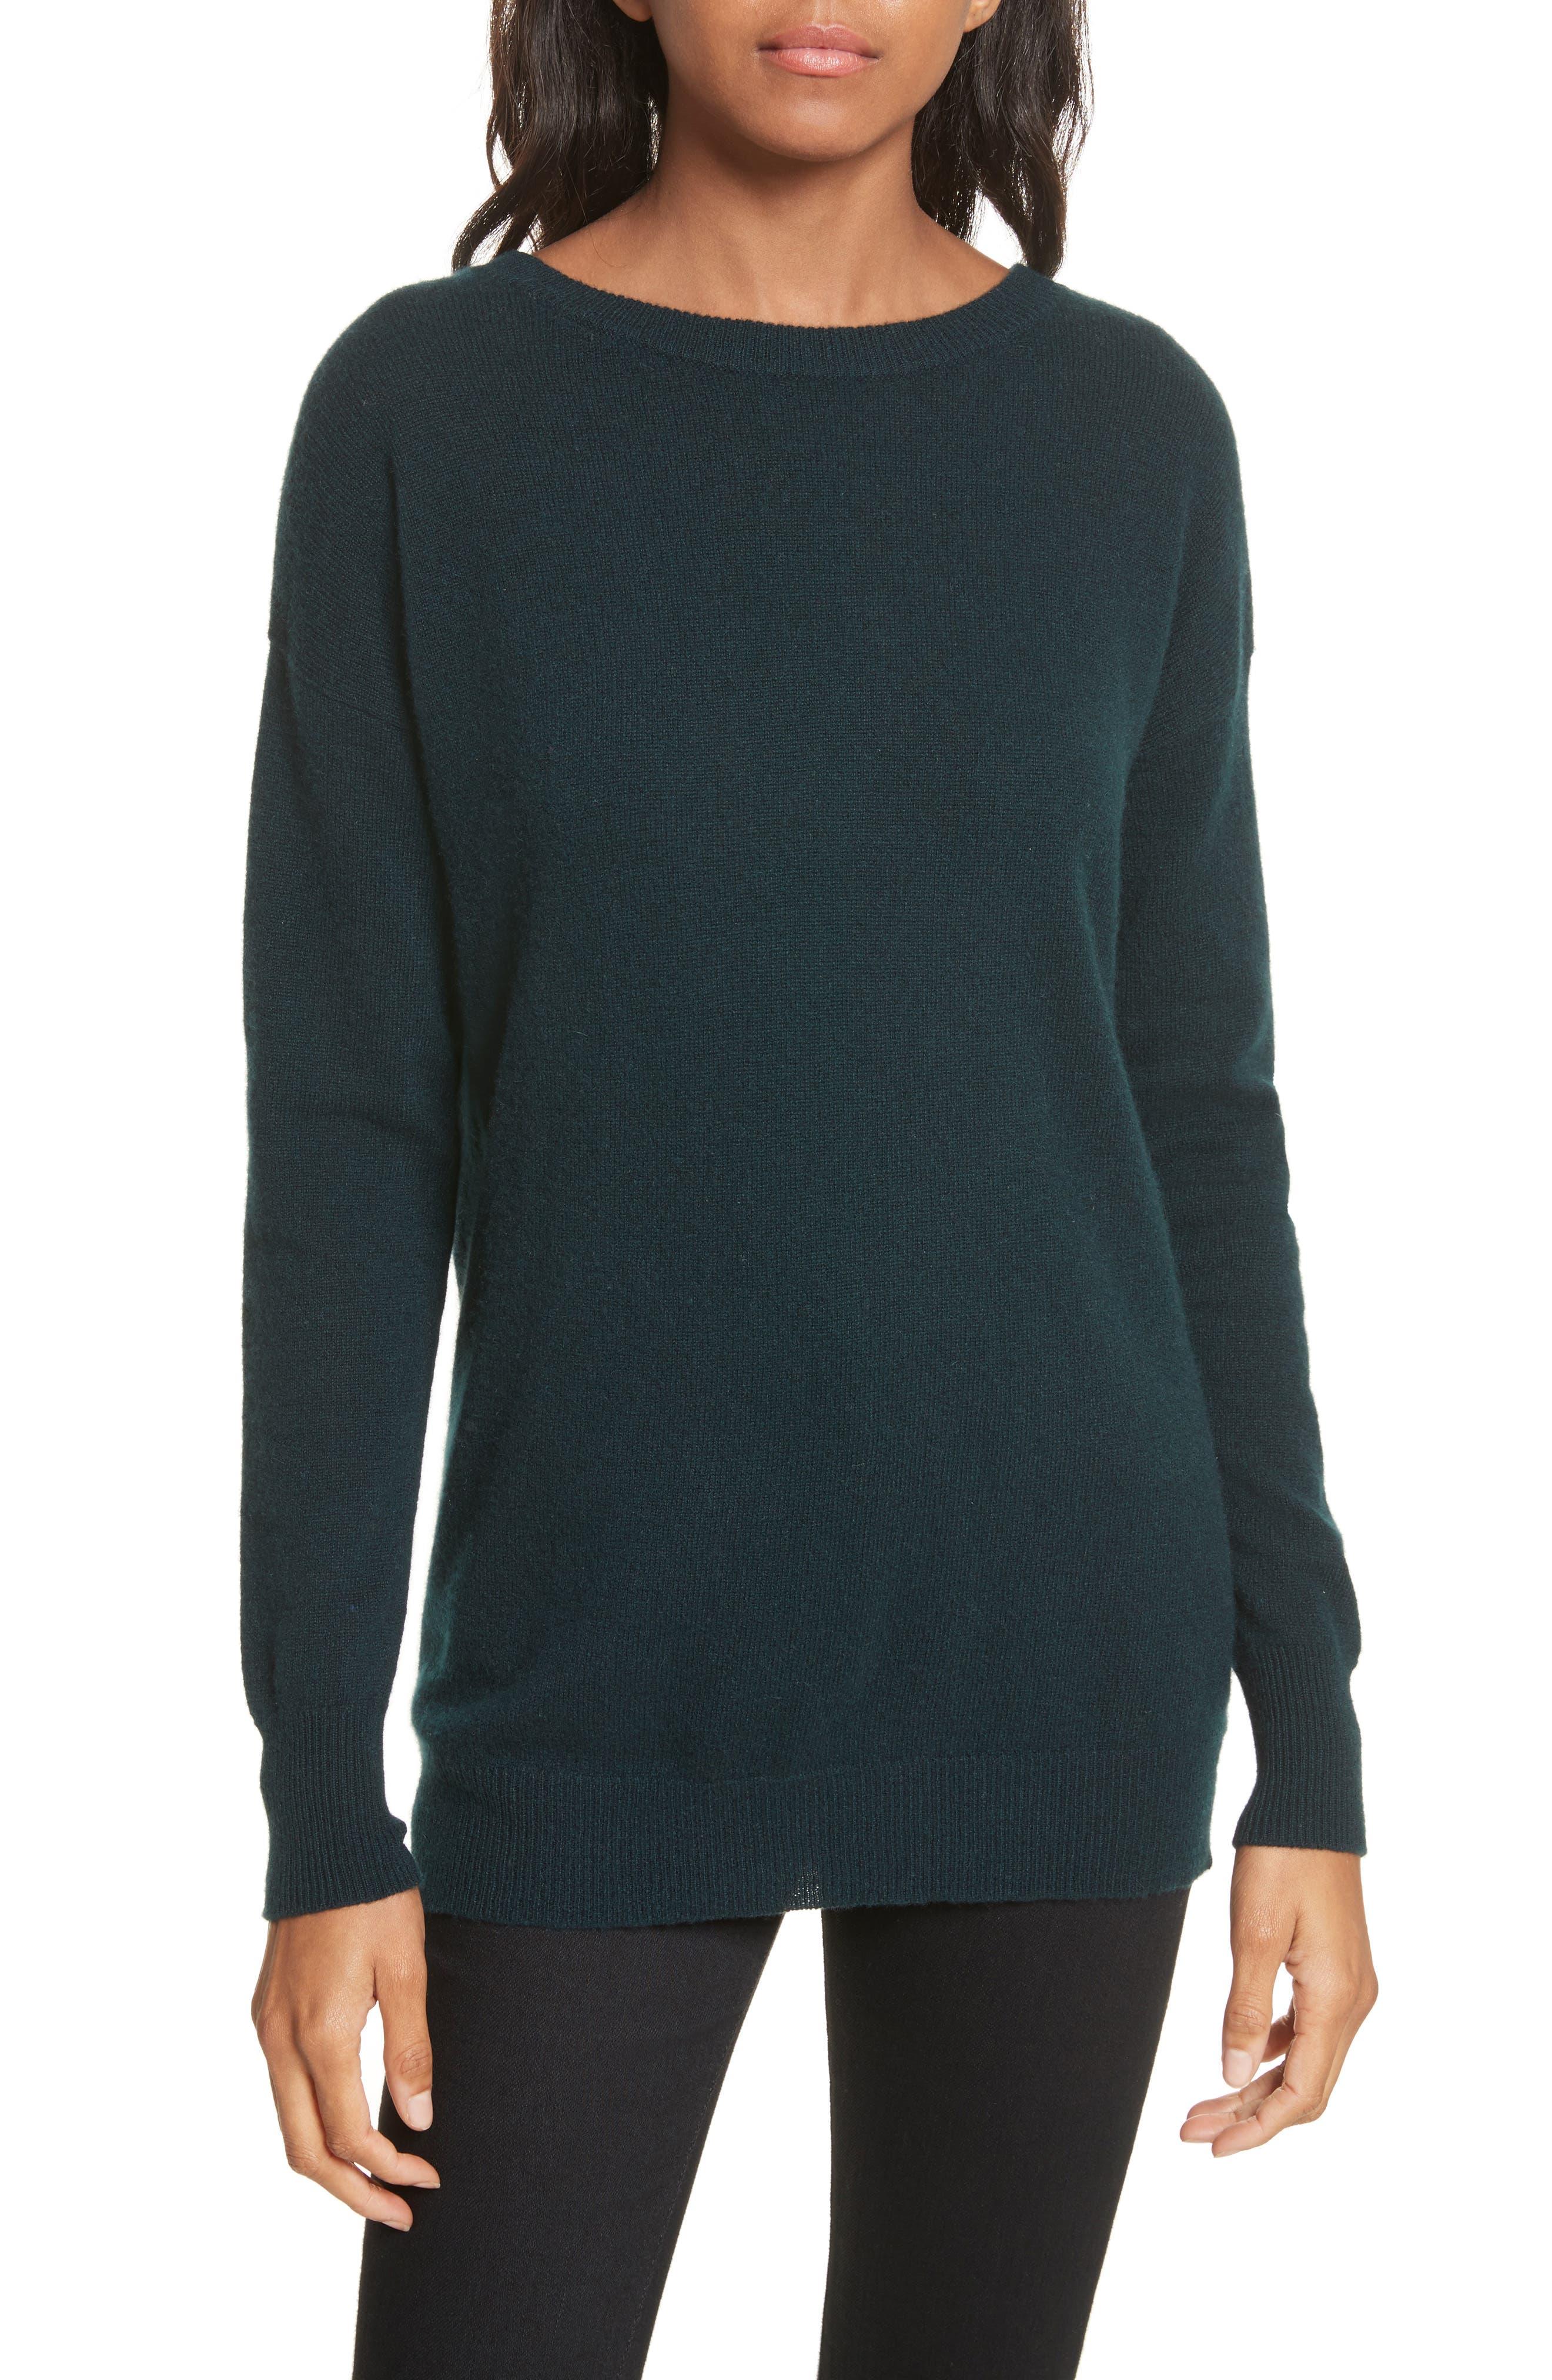 autumn cashmere Velvet Tie Cashmere Sweater